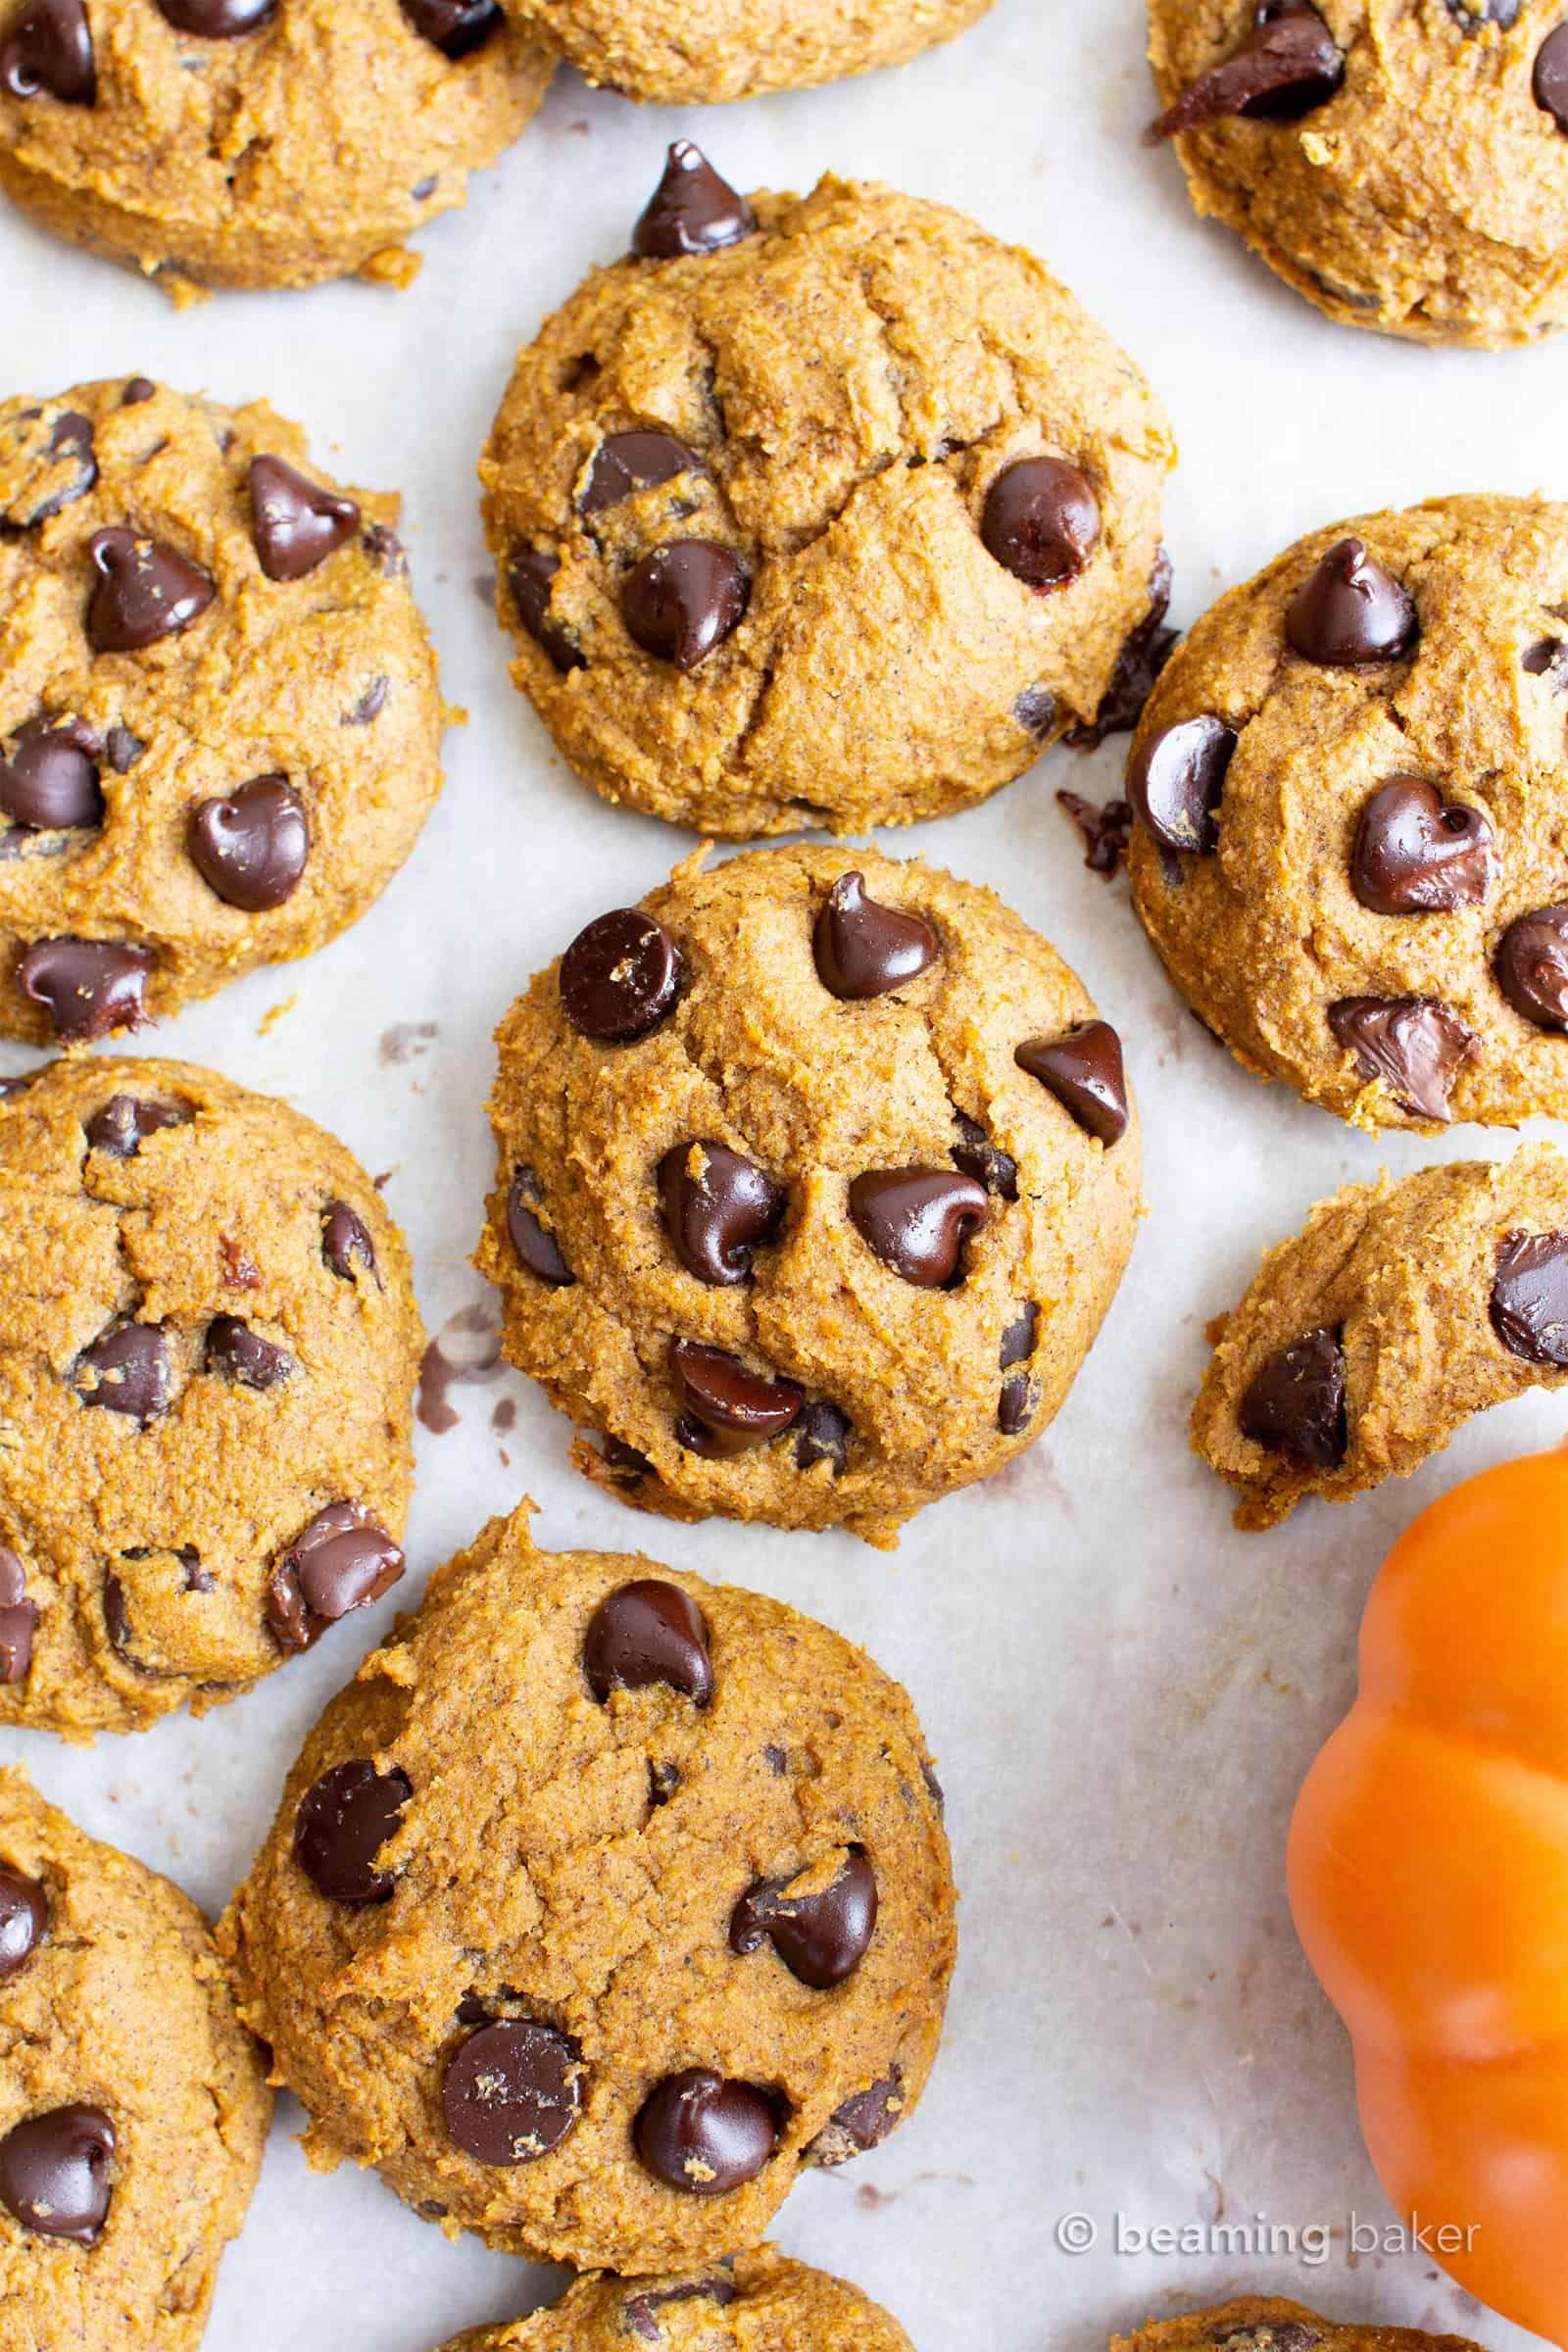 Gluten Free Vegan Pumpkin Chocolate Chip Cookies He Pumpkin